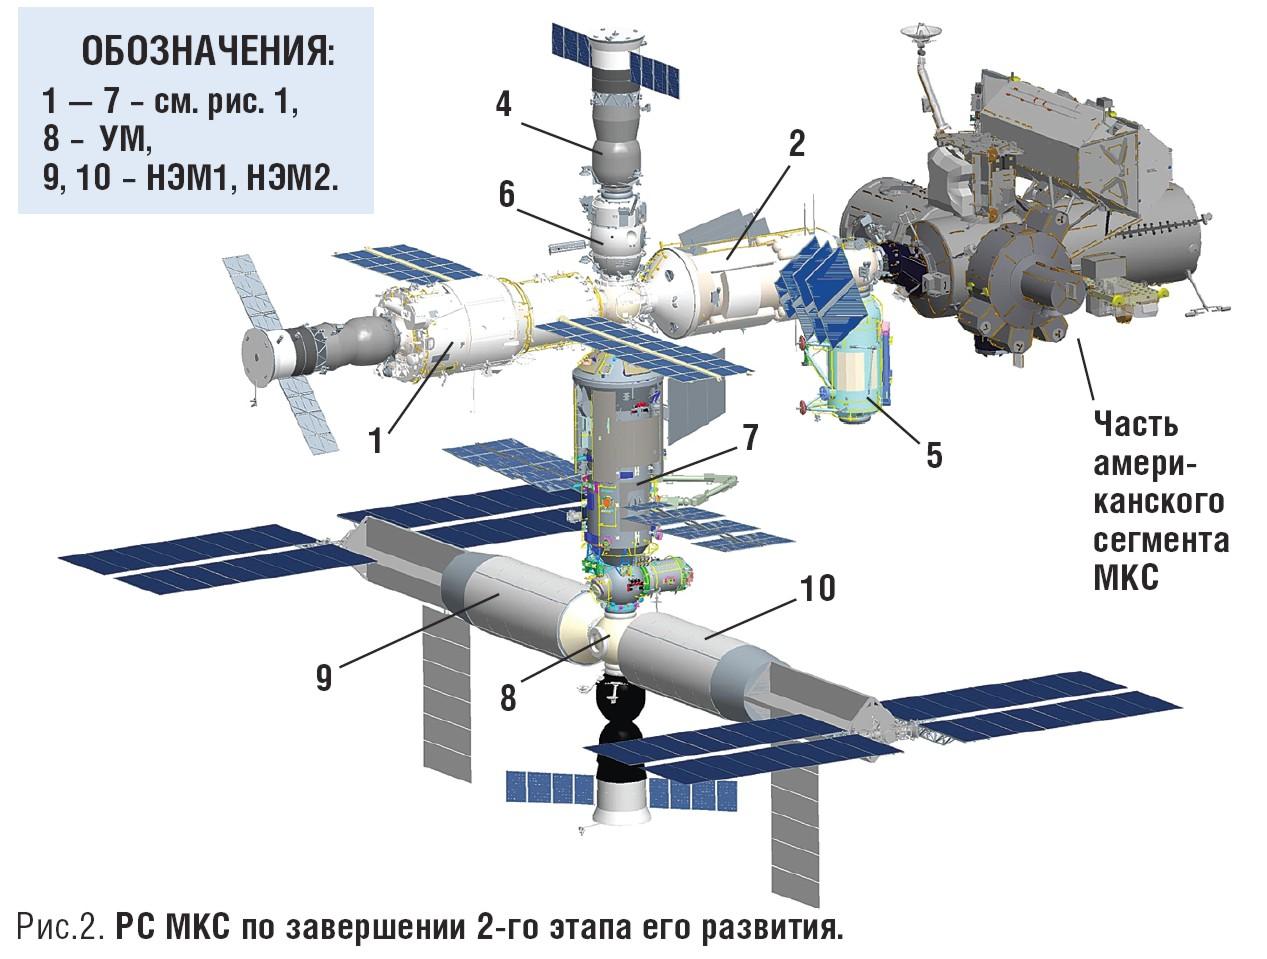 la Russie ajoutera 3 modules à son segment avant 2011 - Page 3 Issrus11